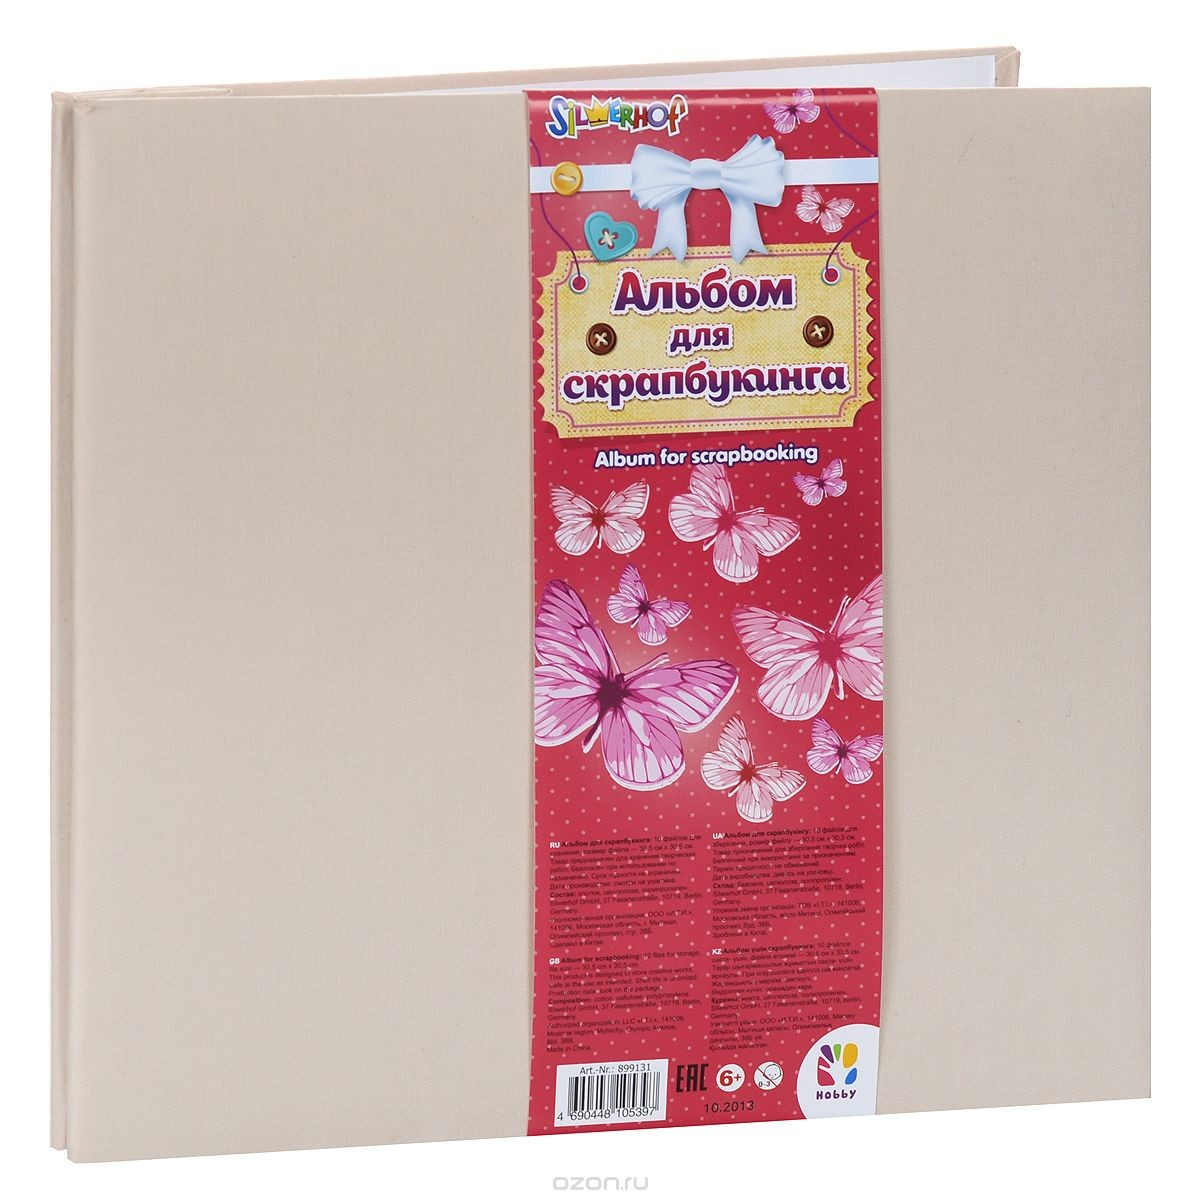 Альбом для скрапбукинга Silwerhof Hobby, цвет: бежевый, 10 листов